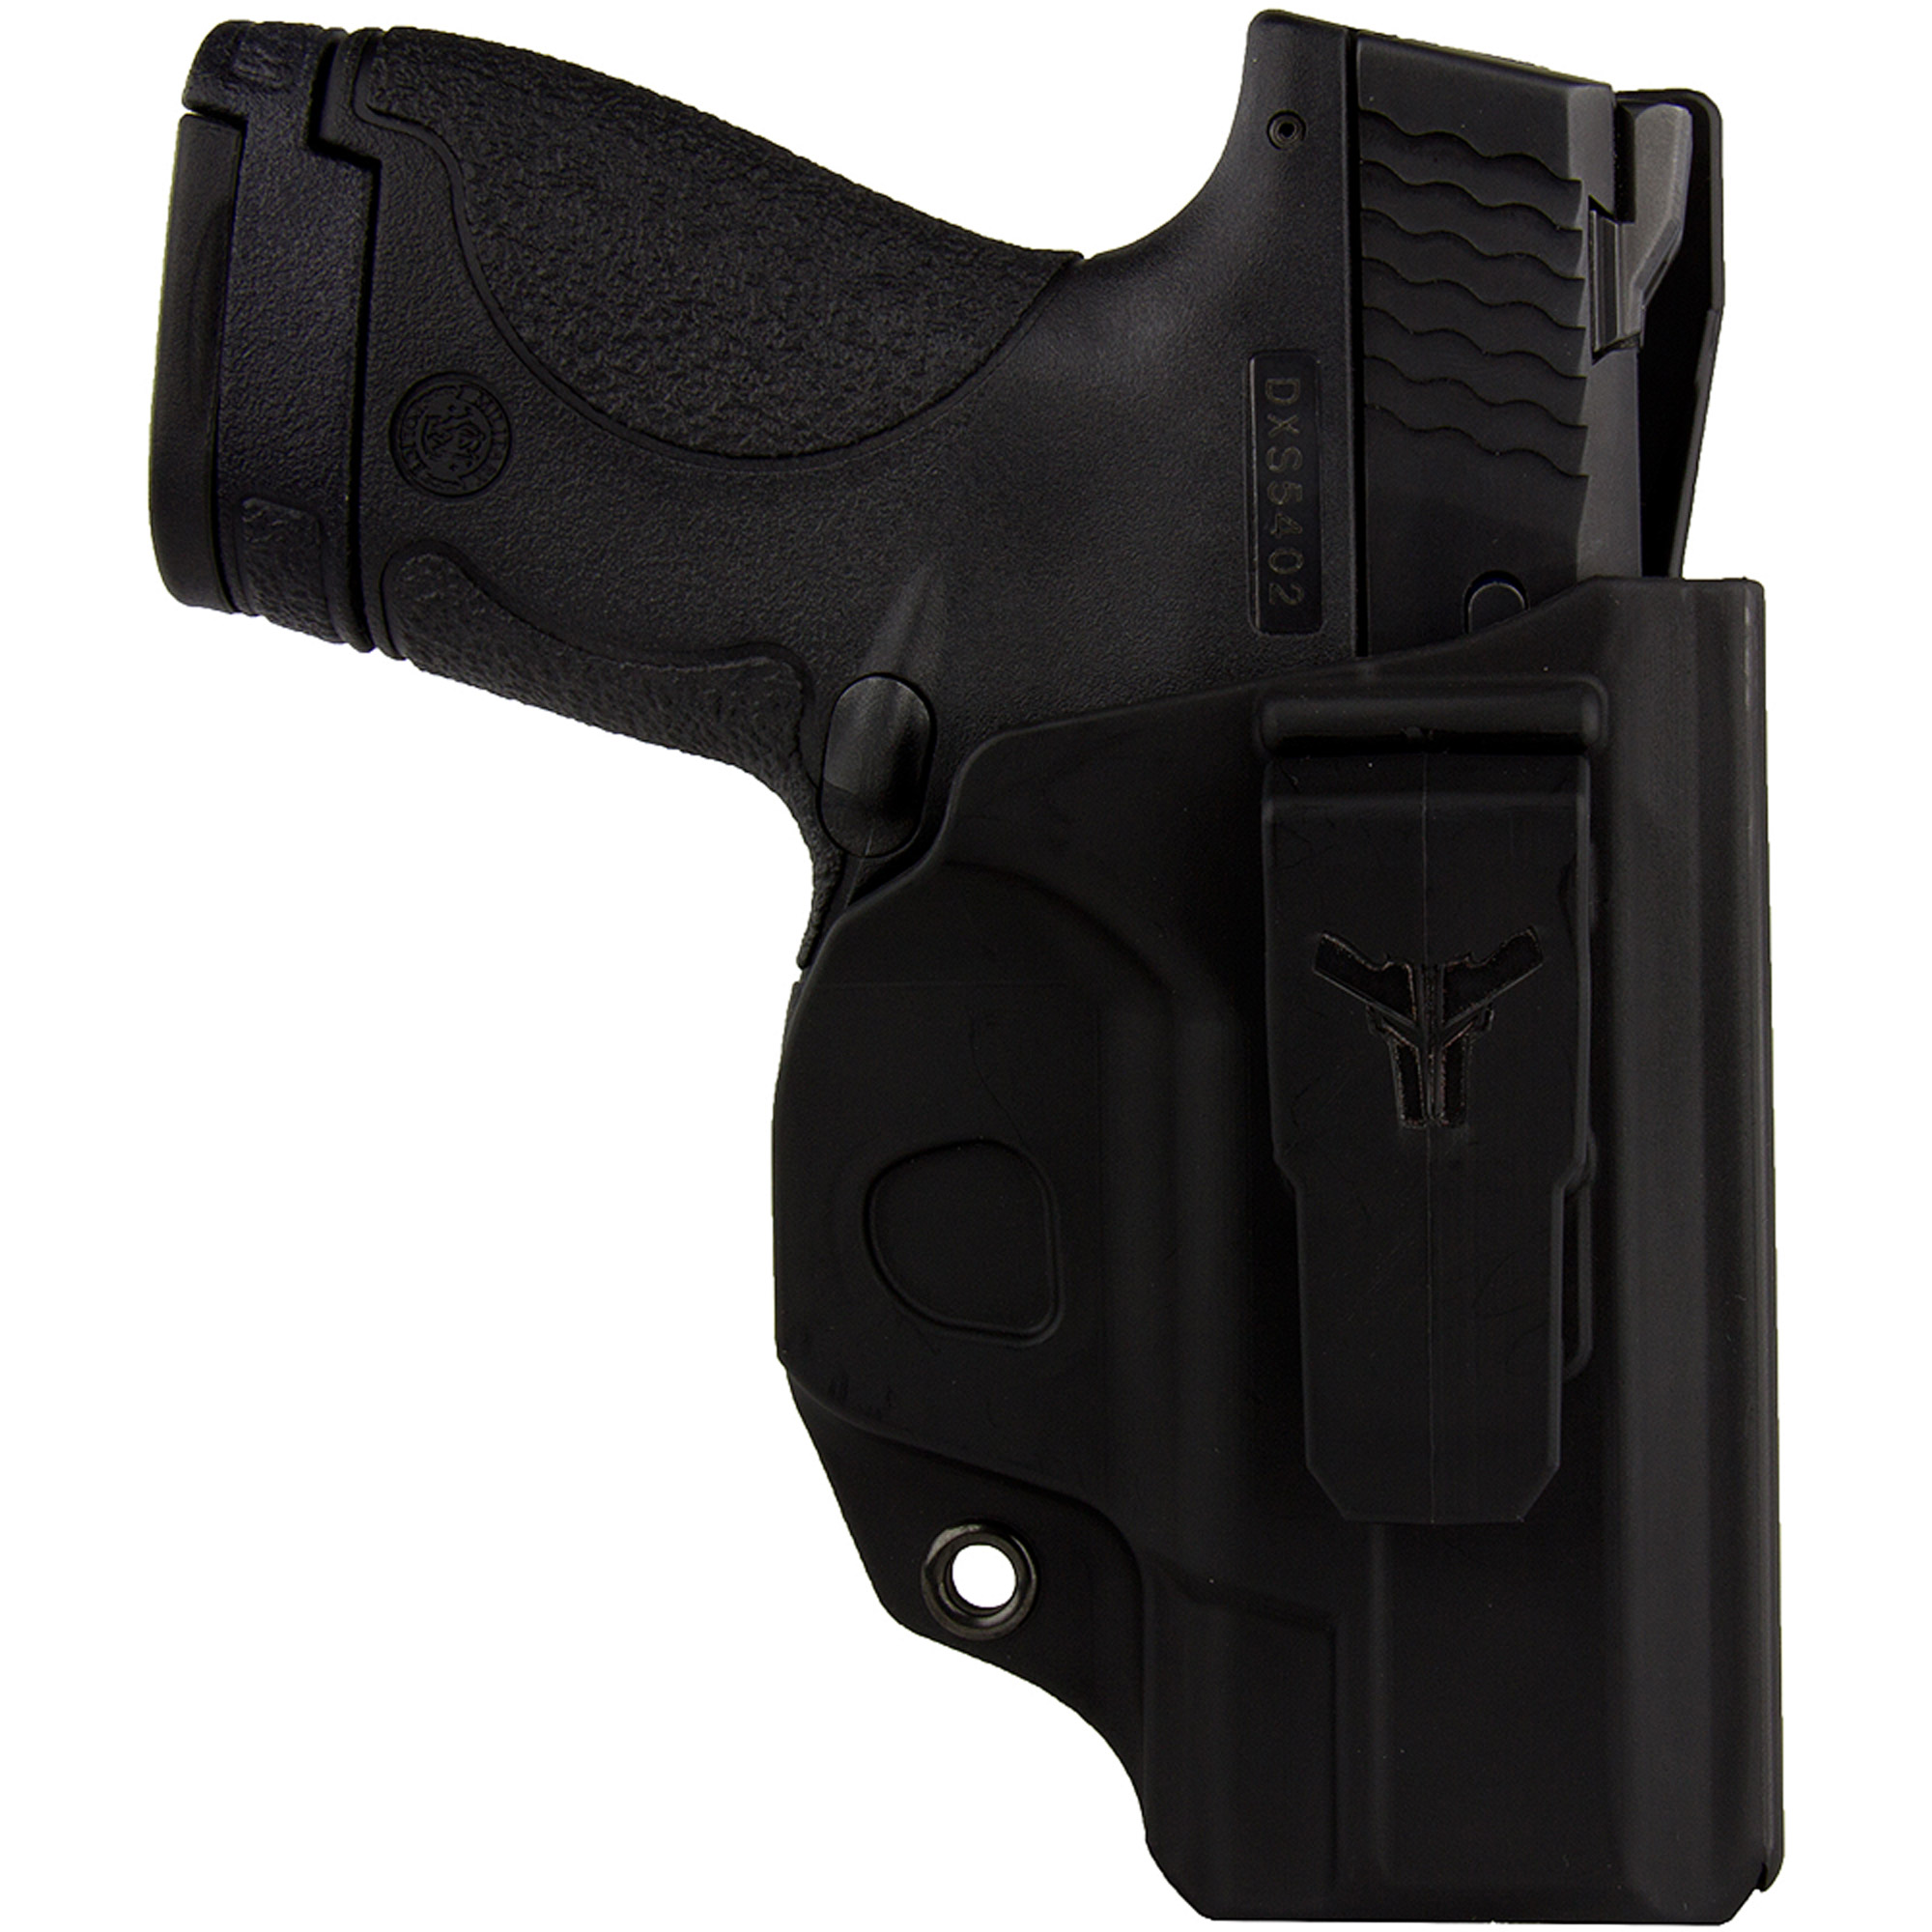 Blade Tech Industries Klipt Holster, Fits S&W M&P Shield, Right Hand, Black